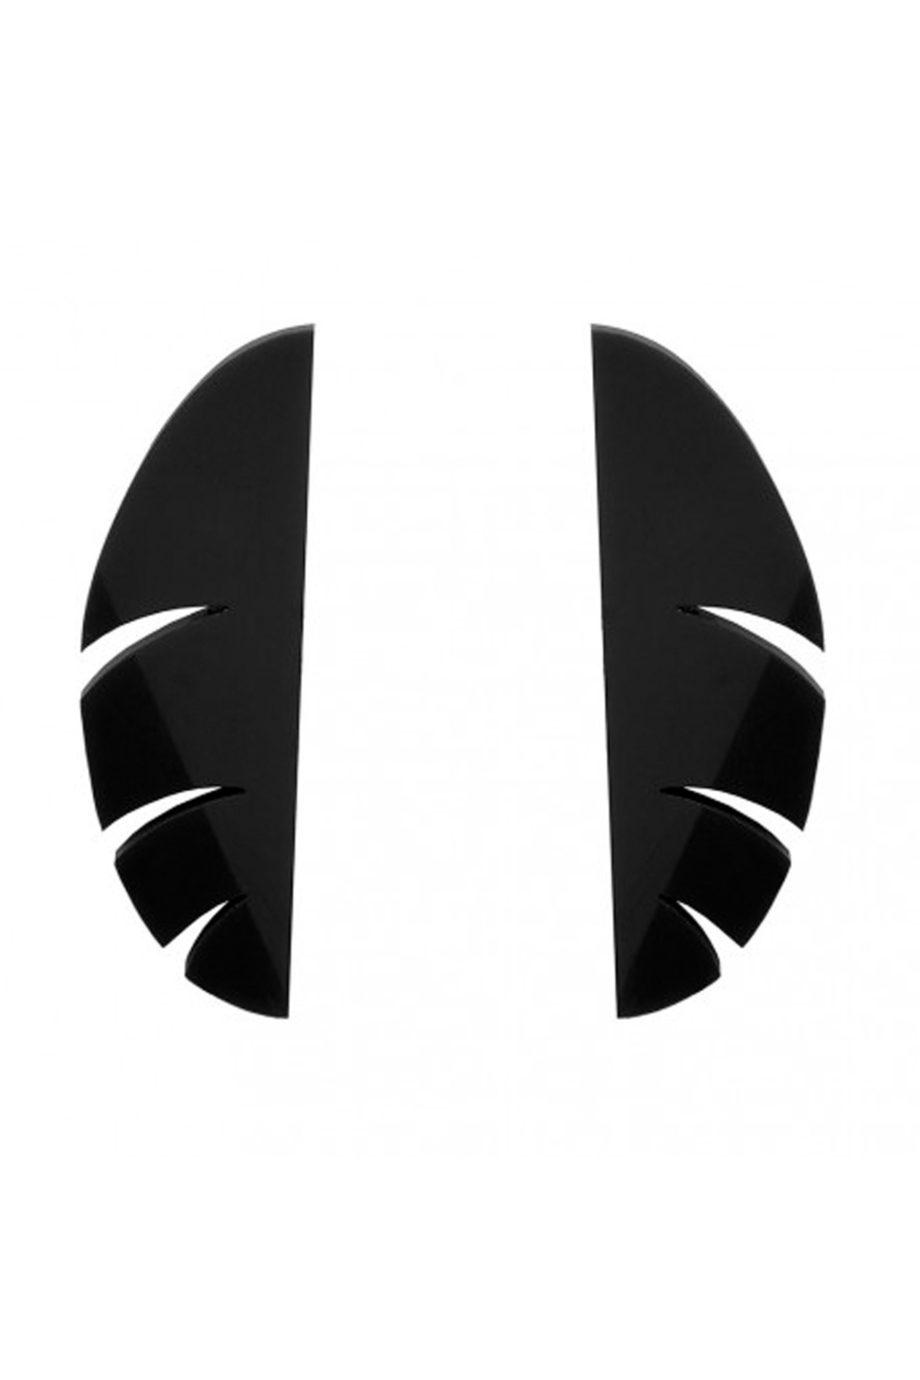 papiroga-pendientes-naturaleza-de-noche